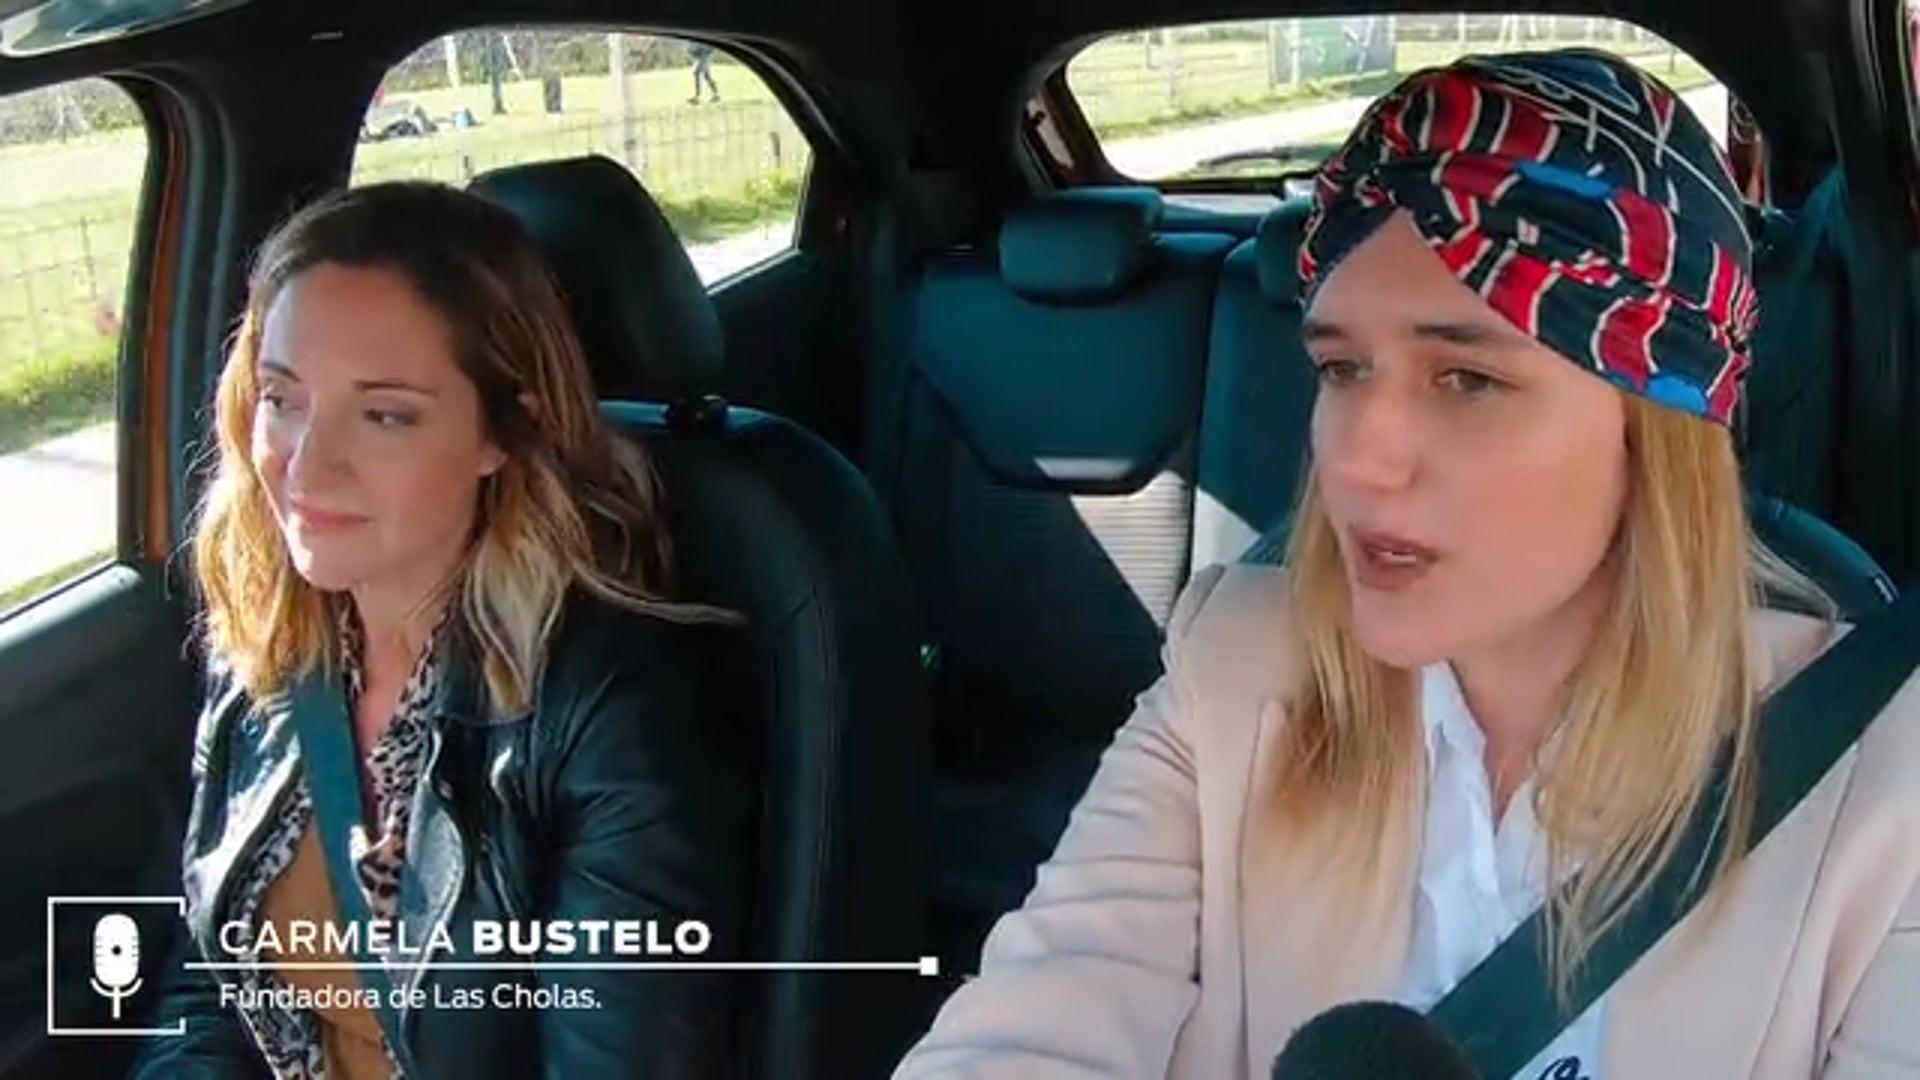 FORD - Fordcast Carmela Bustelo Teaser